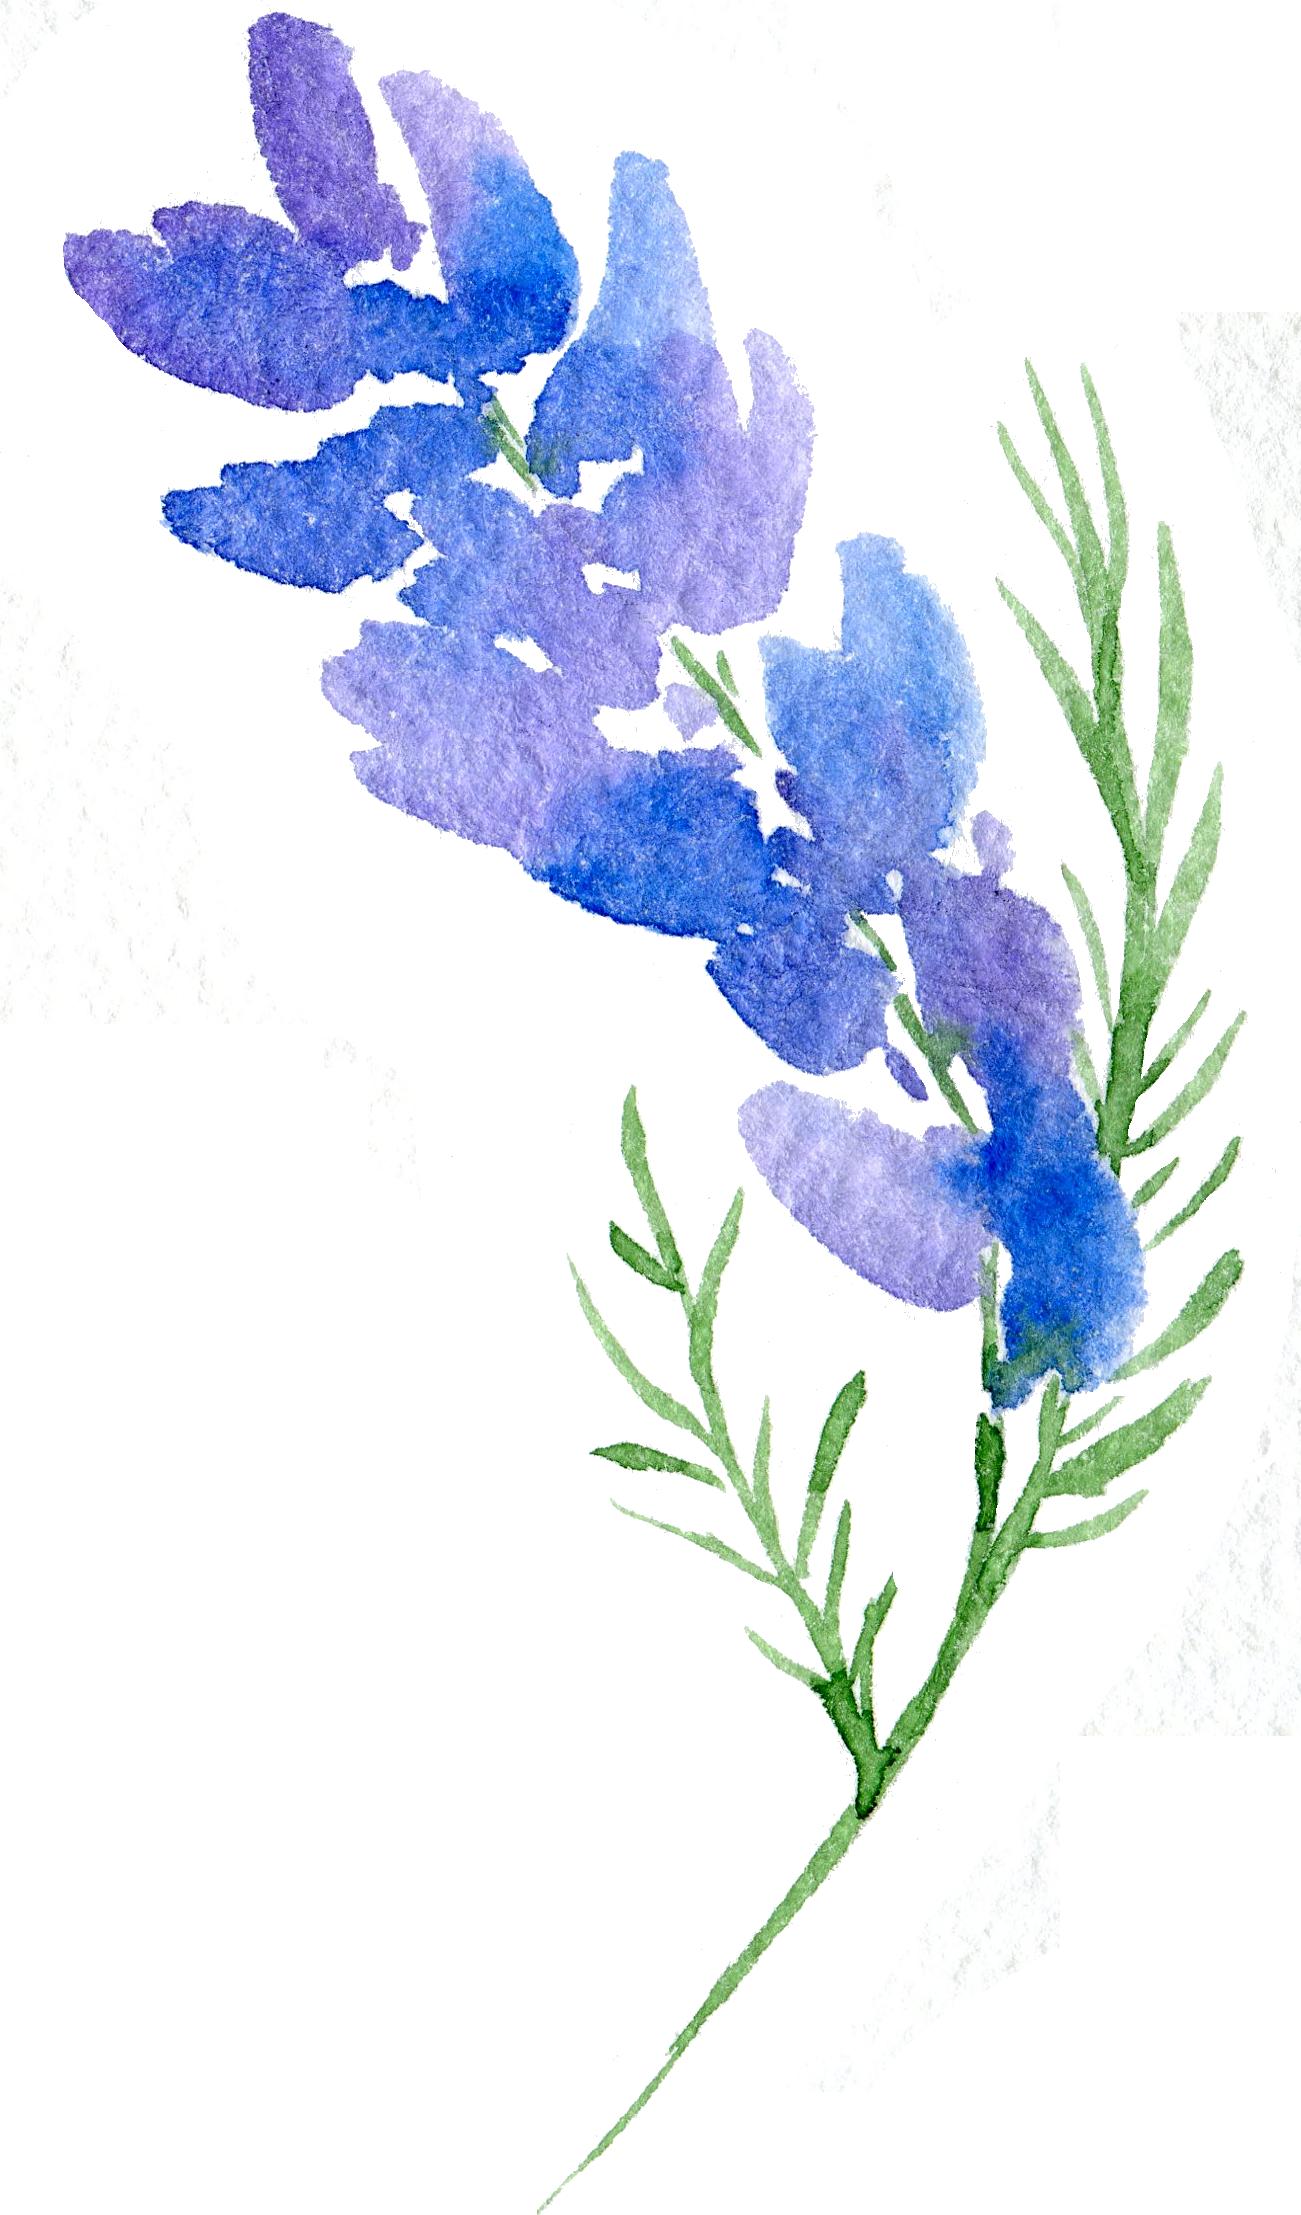 Floral Design Flower Watercolor Painting Transparent Background